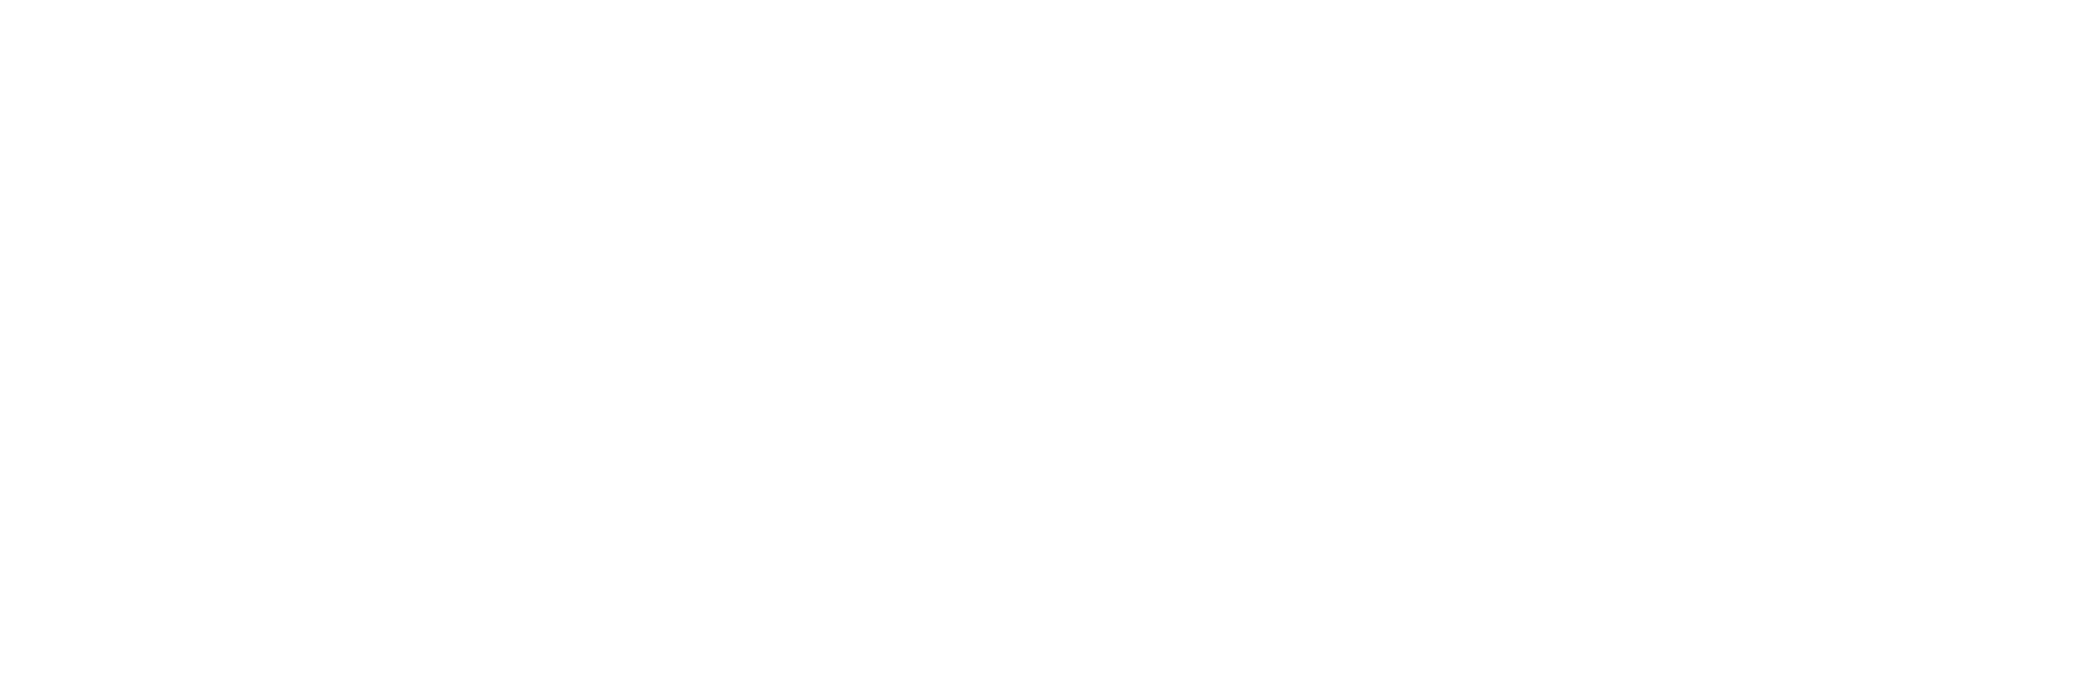 Testimonial_mekky.png